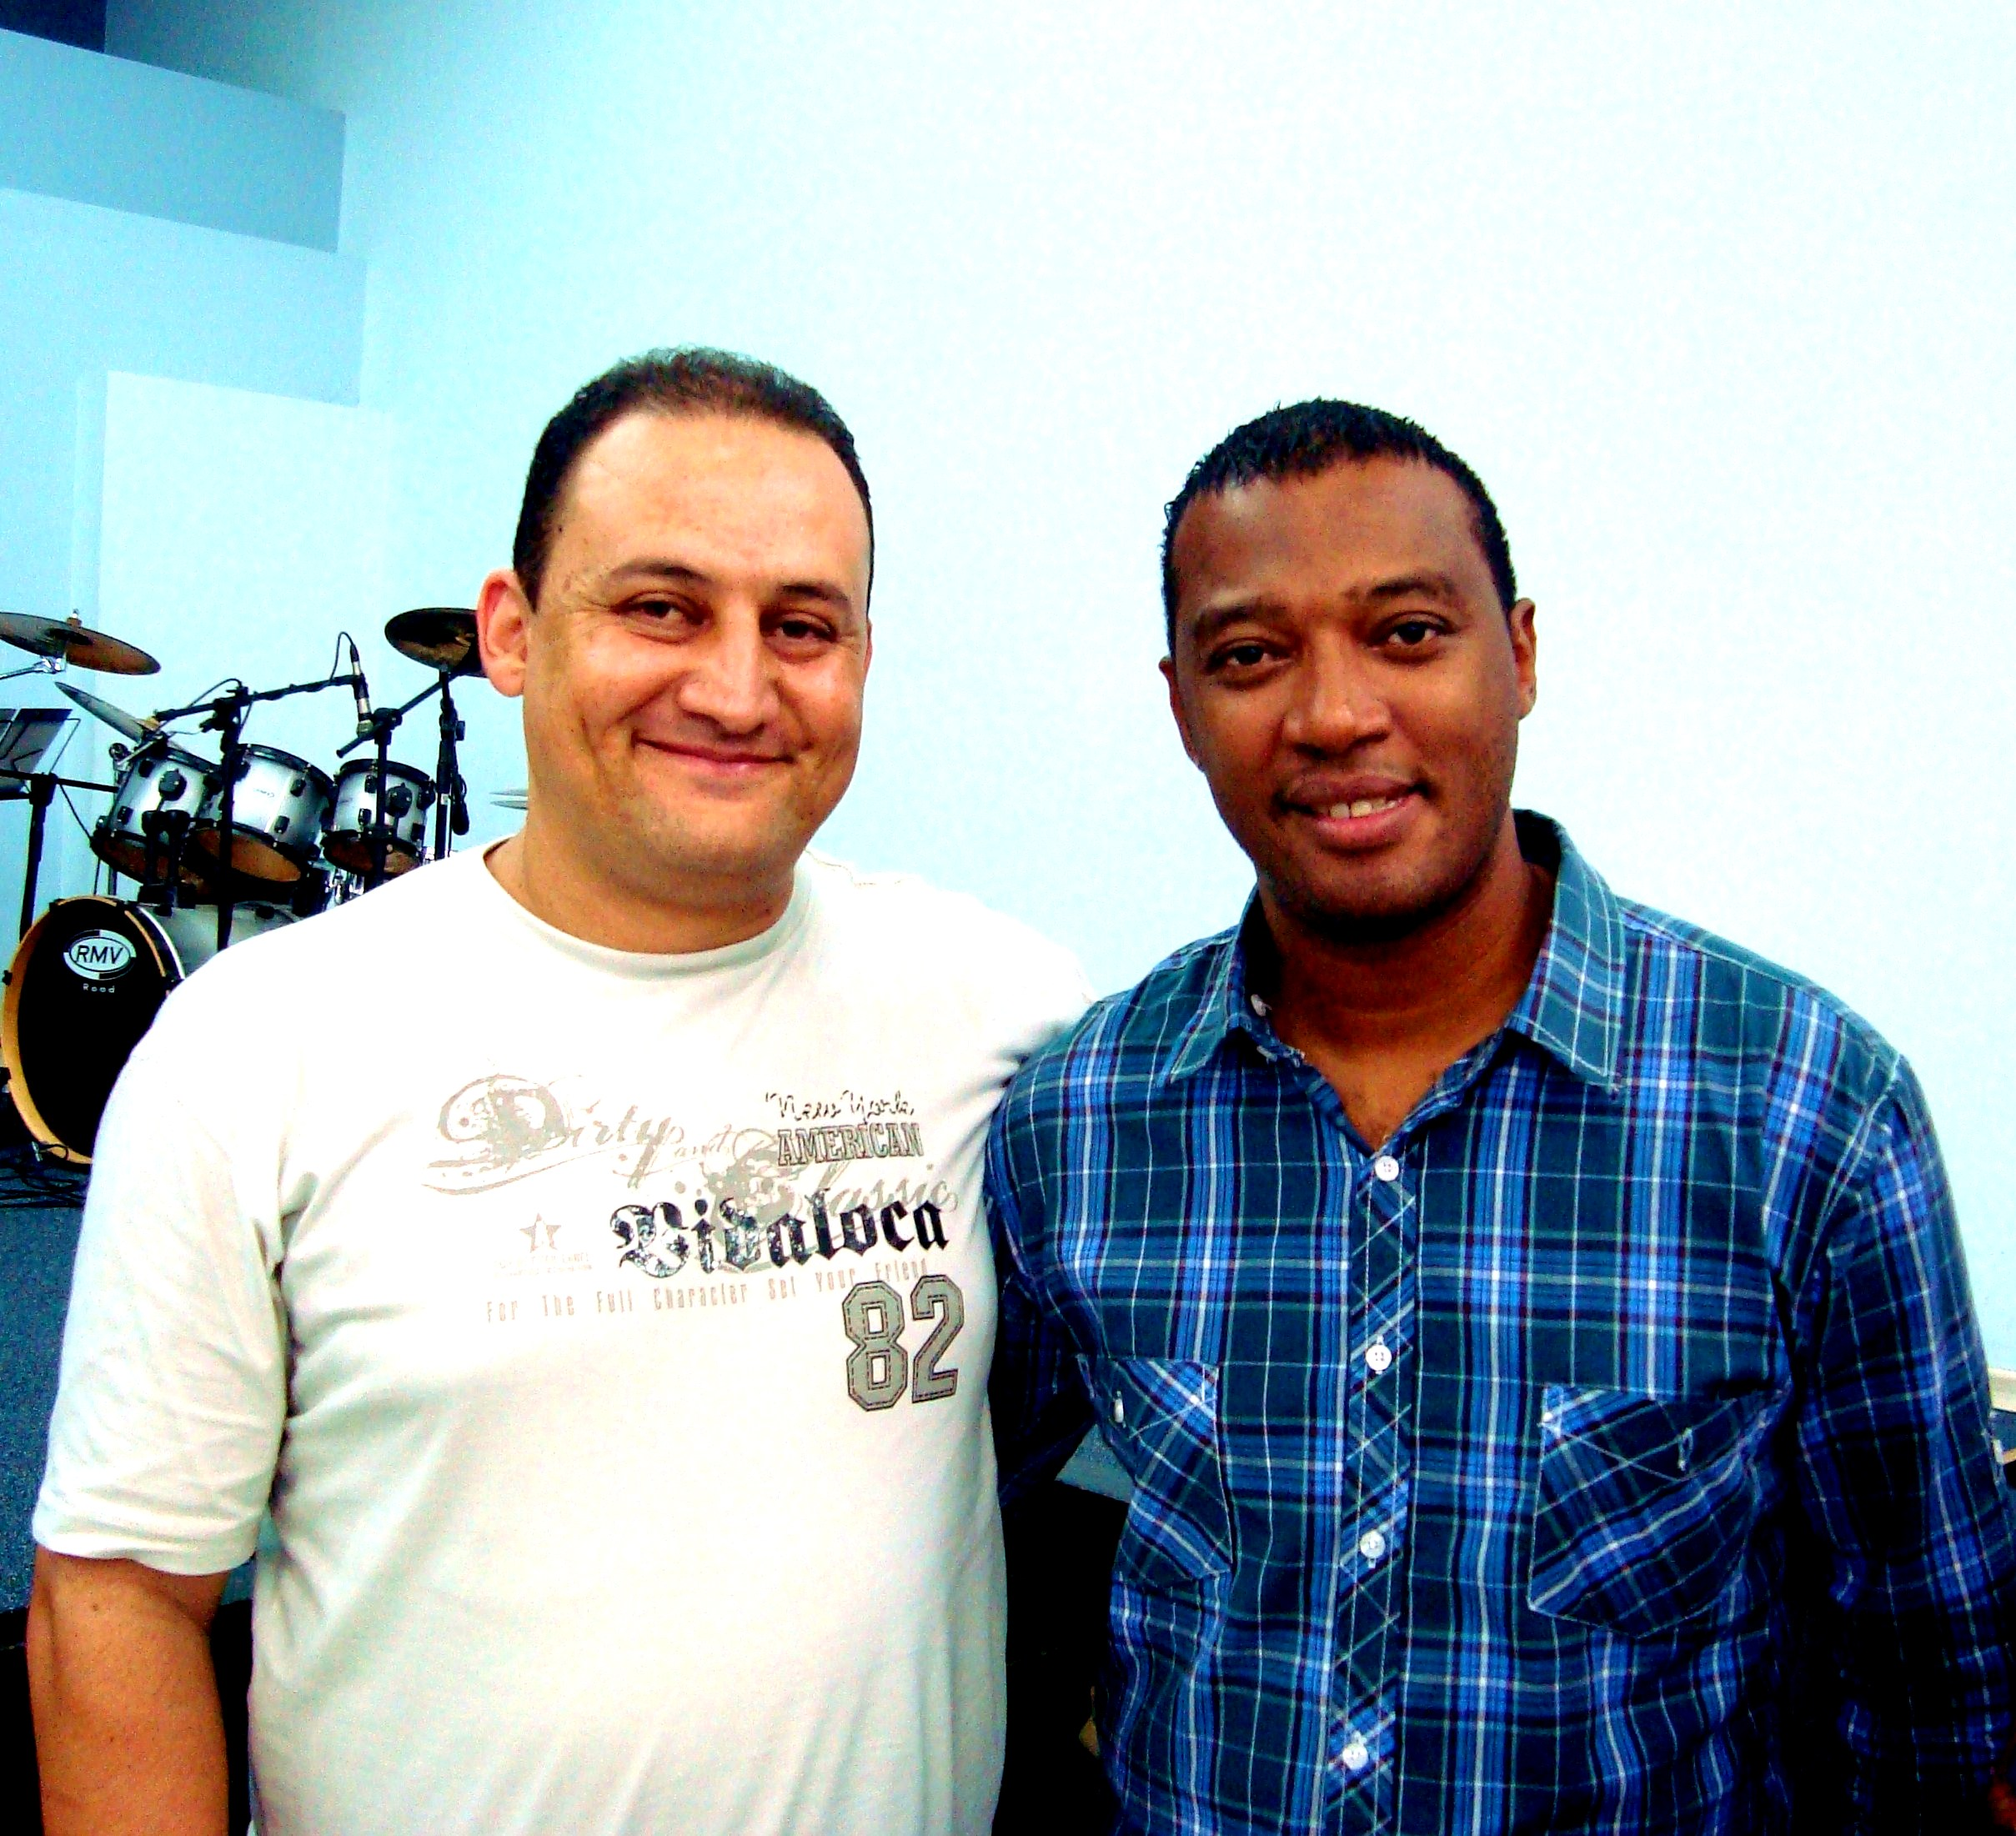 Lincoln/ Marquinhos Gomes